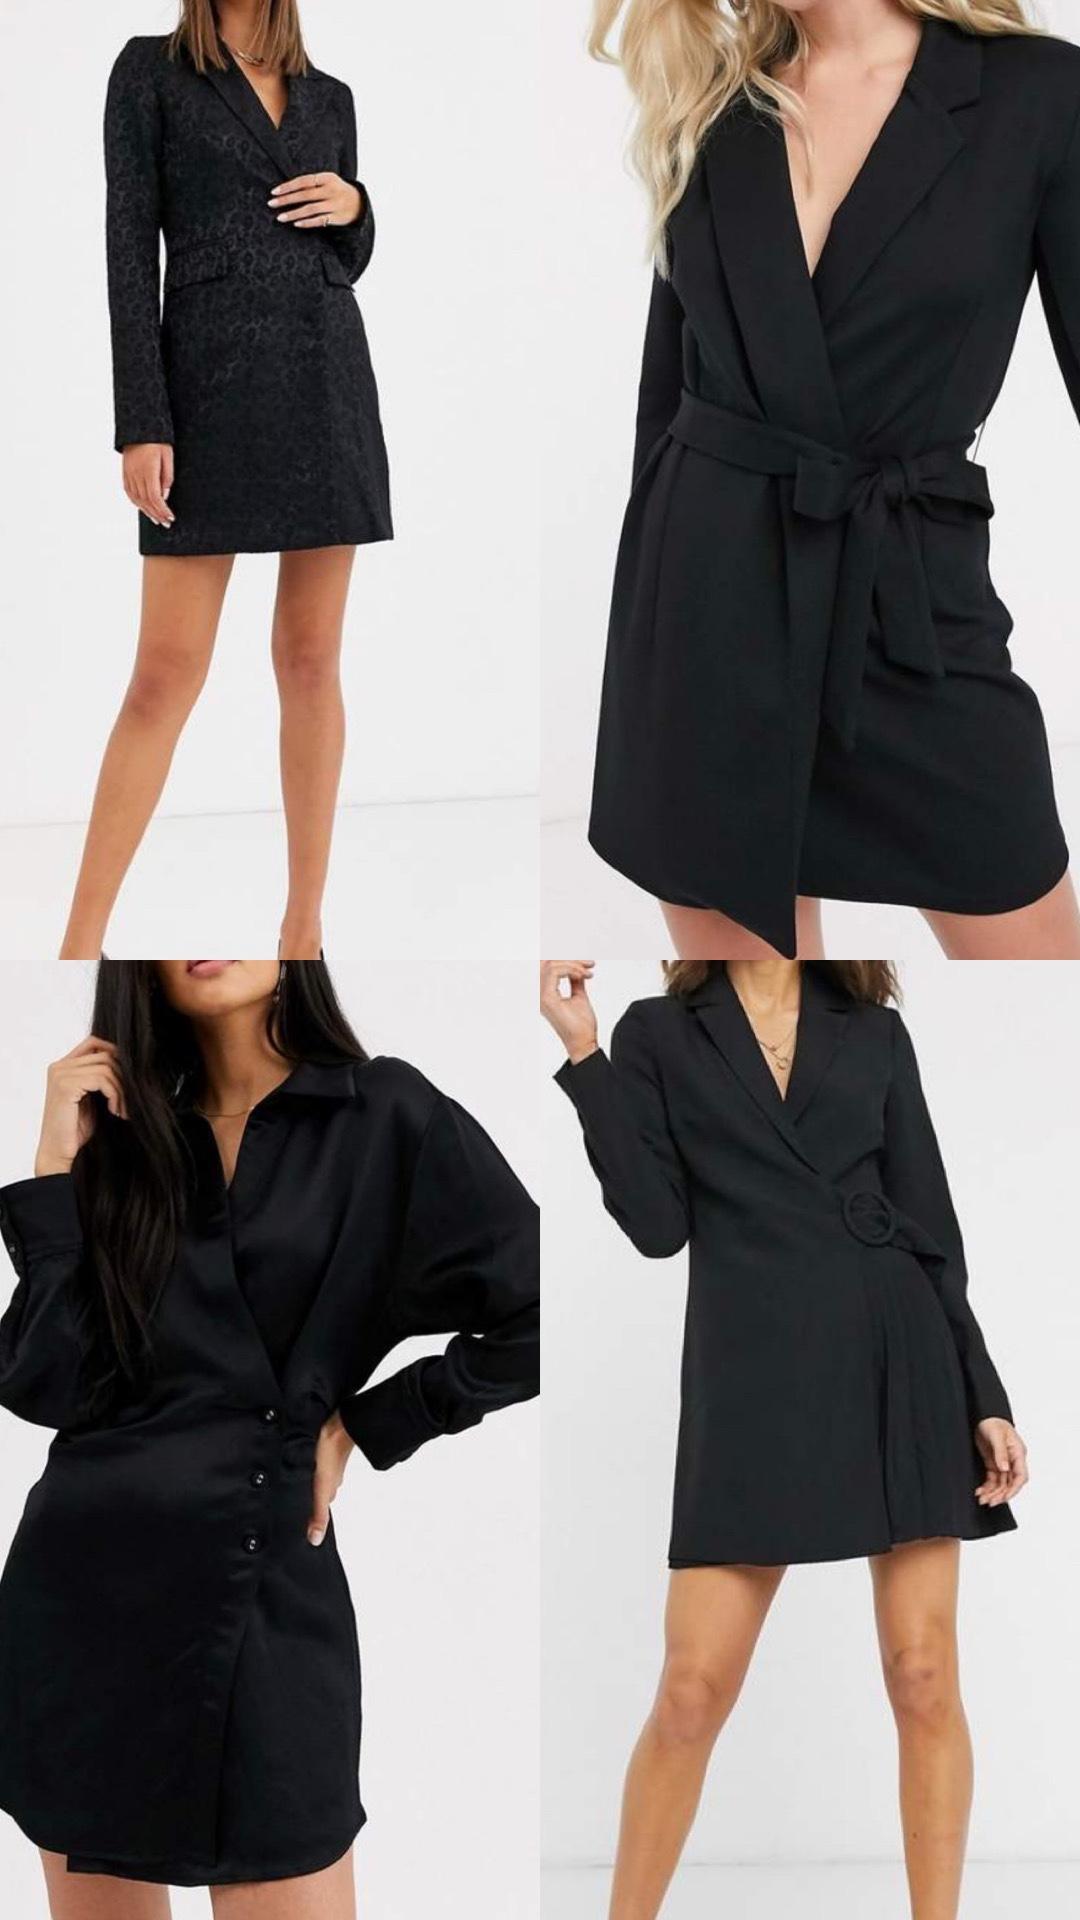 Blazer dresses on ASOS